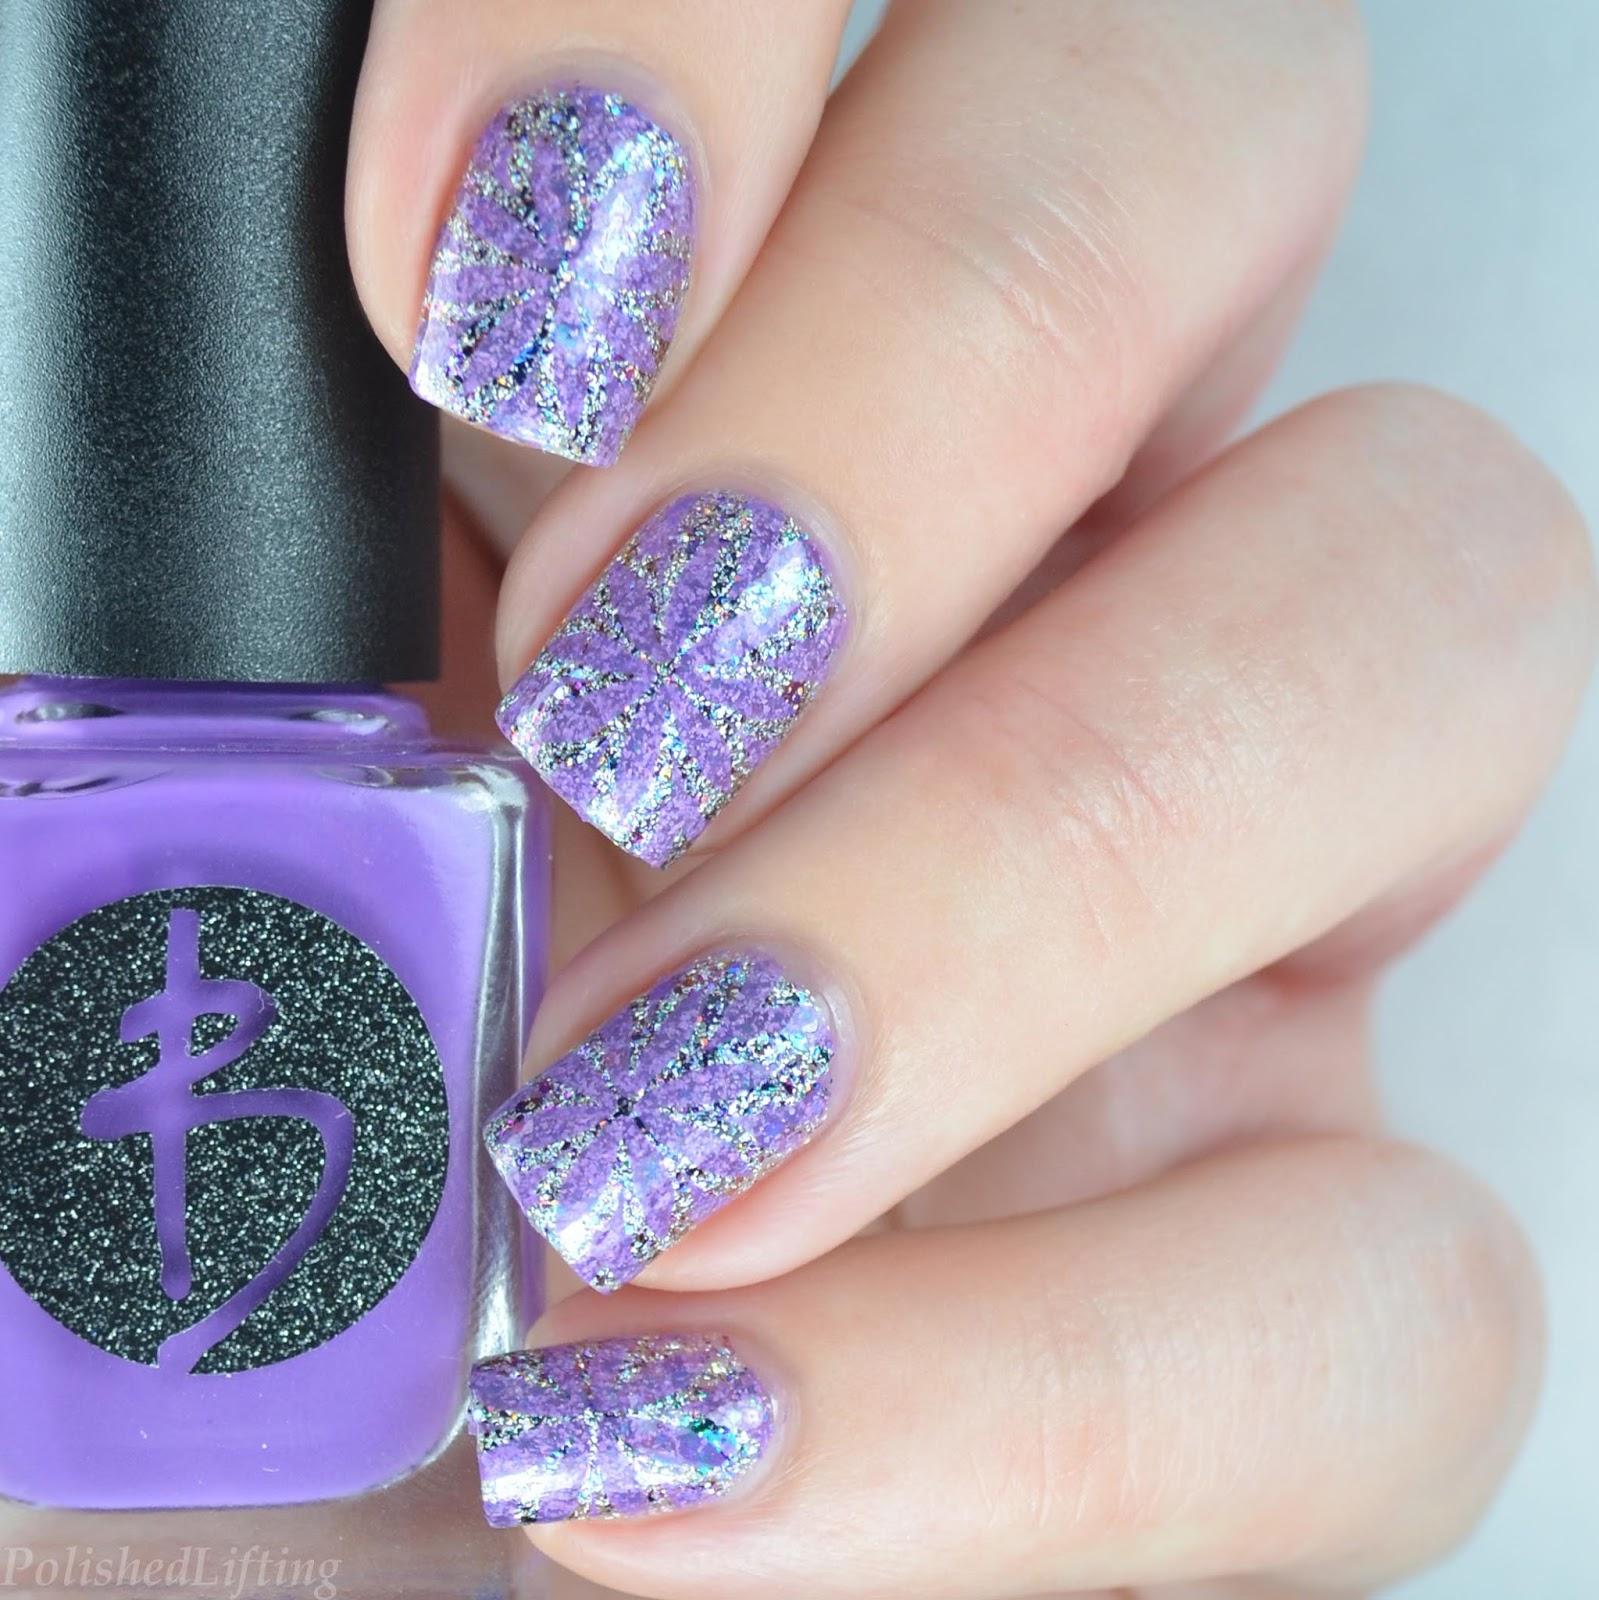 Nail Art Supplies London: MoYou London Kaleidoscope Nail Art Featuring Darling Diva